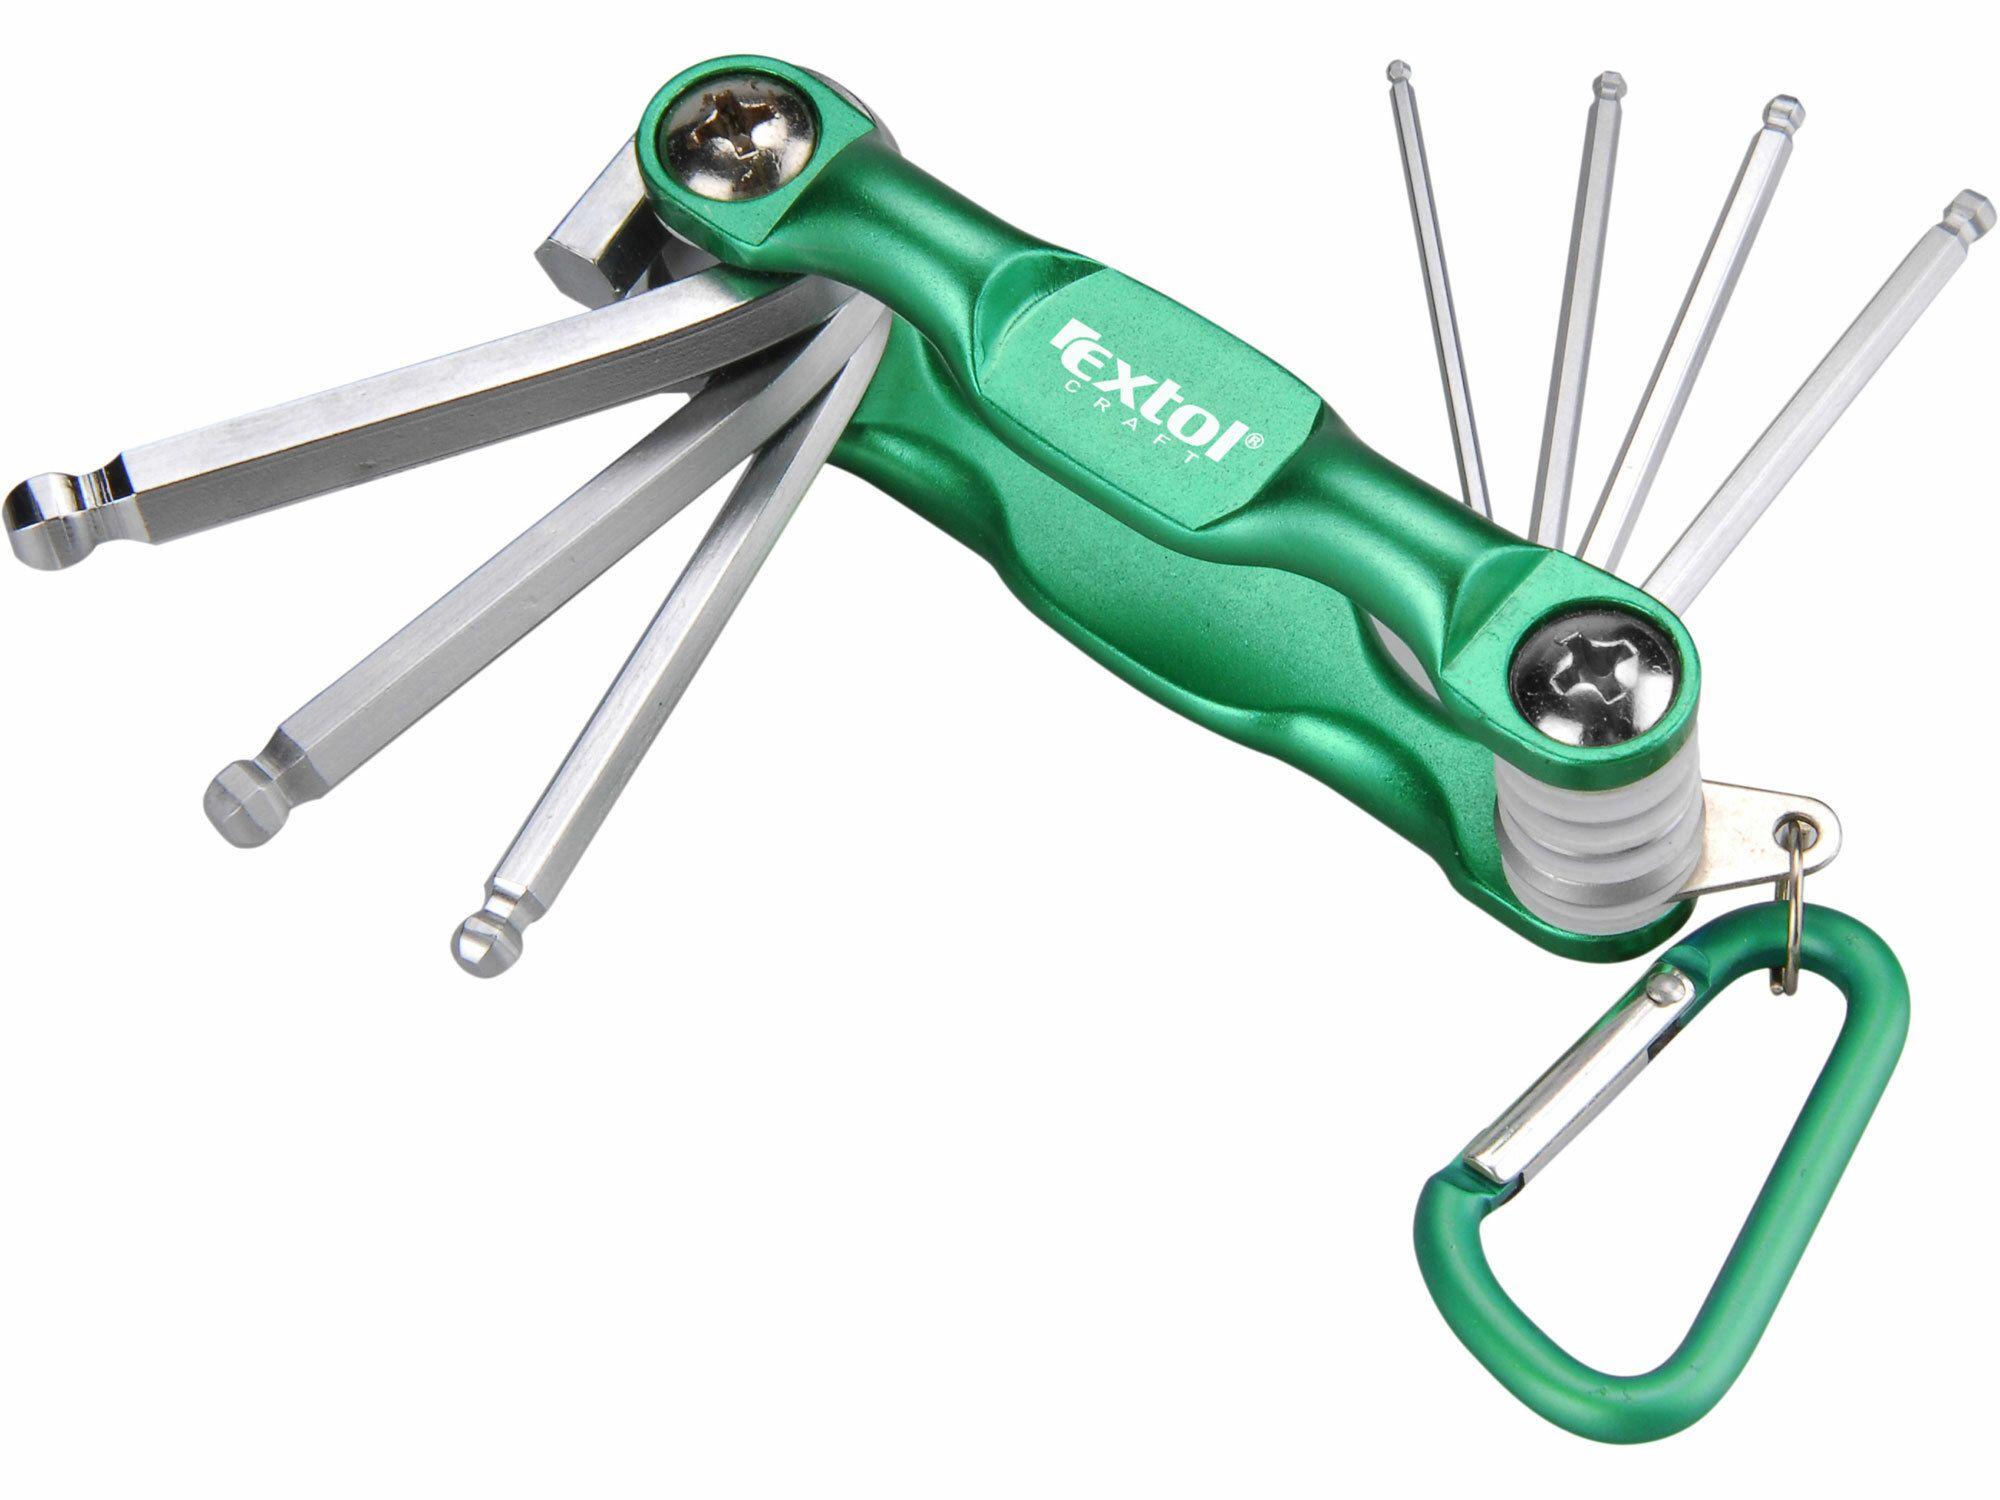 Klíče imbus, 7ks, 1,5-2-2,5-3-4-5-6mm, mix barev,praktický skládací obal, EXTOL CRAFT